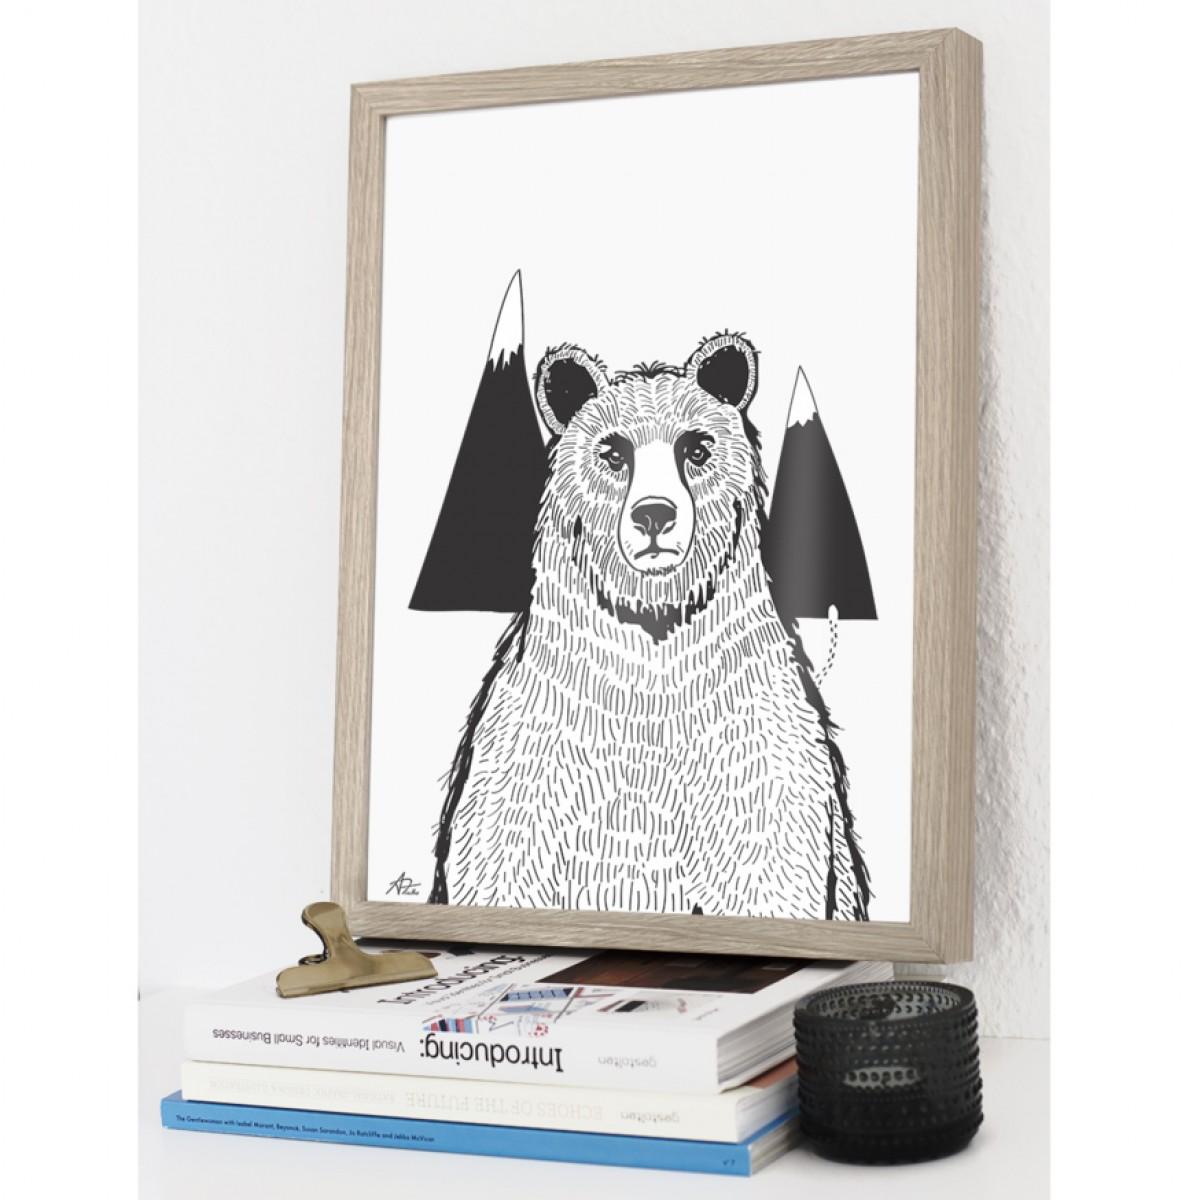 Coco Lapine Design A Bear Print